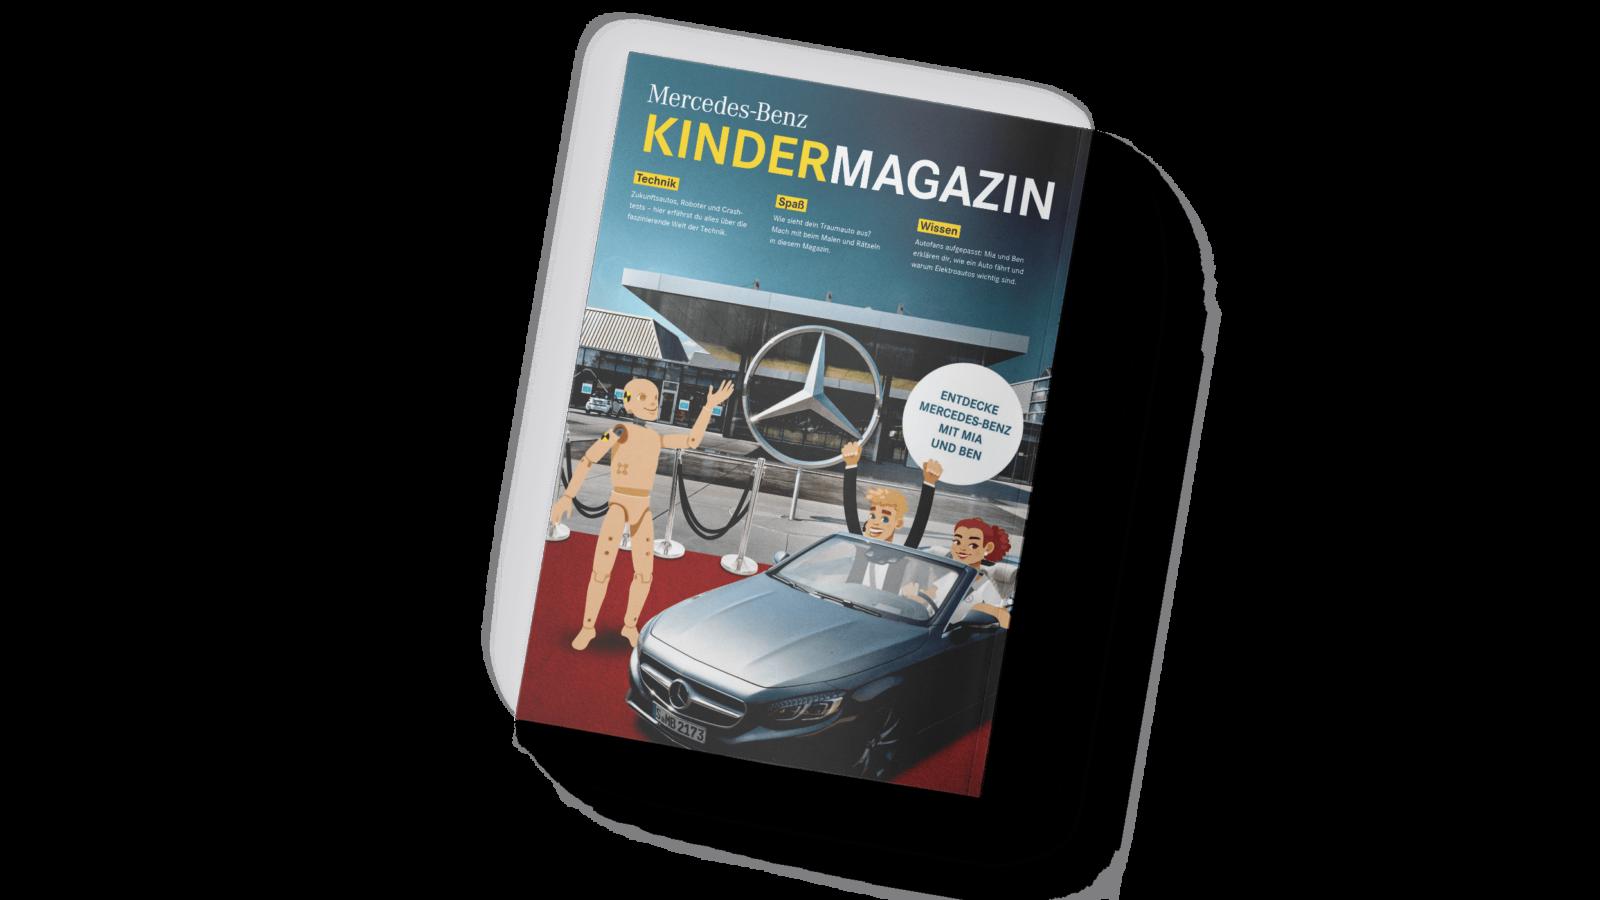 Mercedes Benz Kindermagazin Mockup